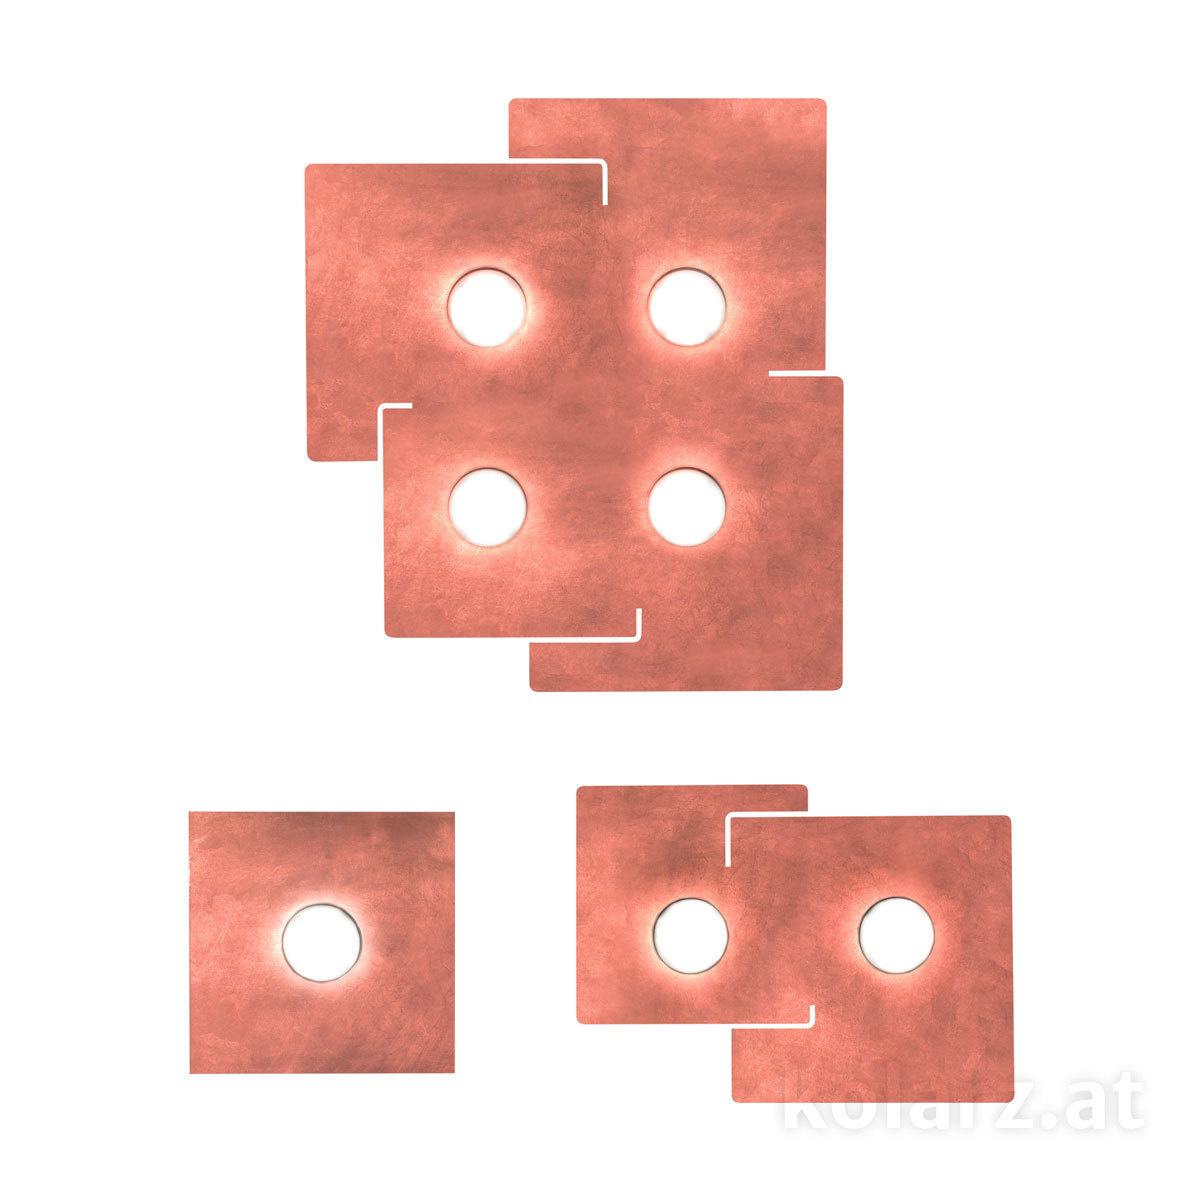 A1337-12-1-Cu-f2.jpg